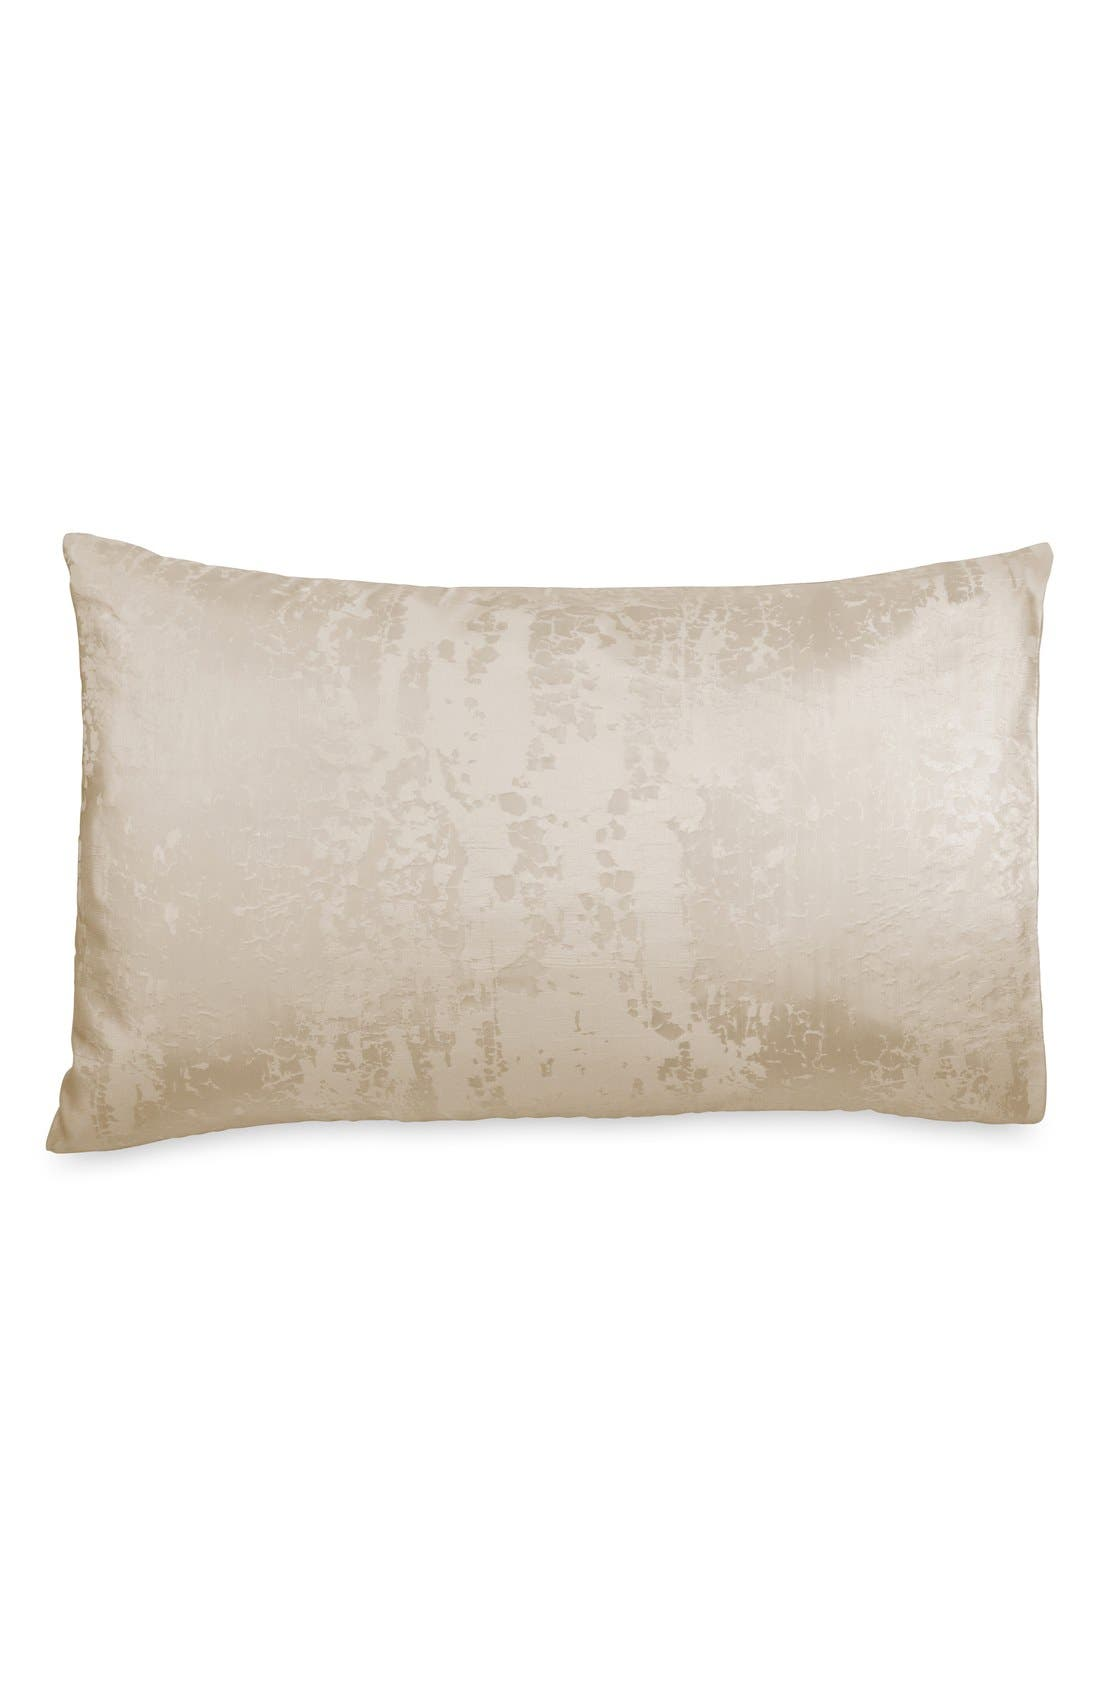 donna karan collection pillow sham